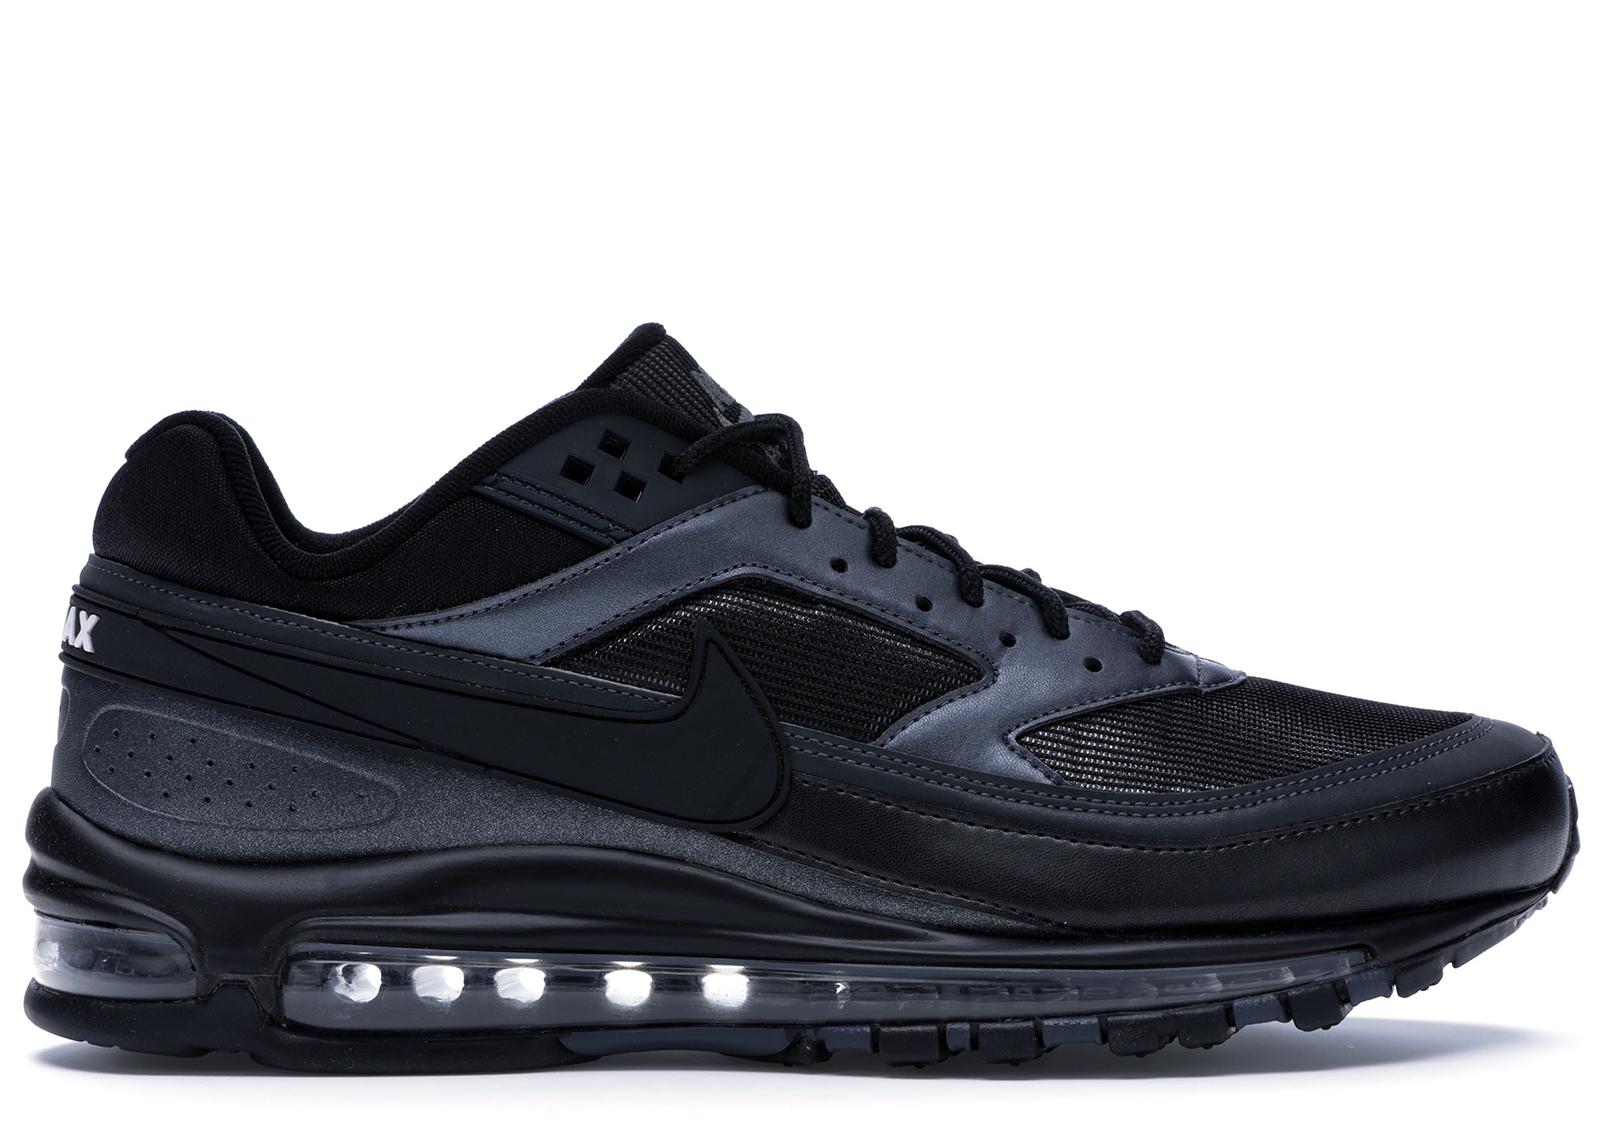 Nike Air Max 97/BW Black Metallic Hematite - AO2406-001